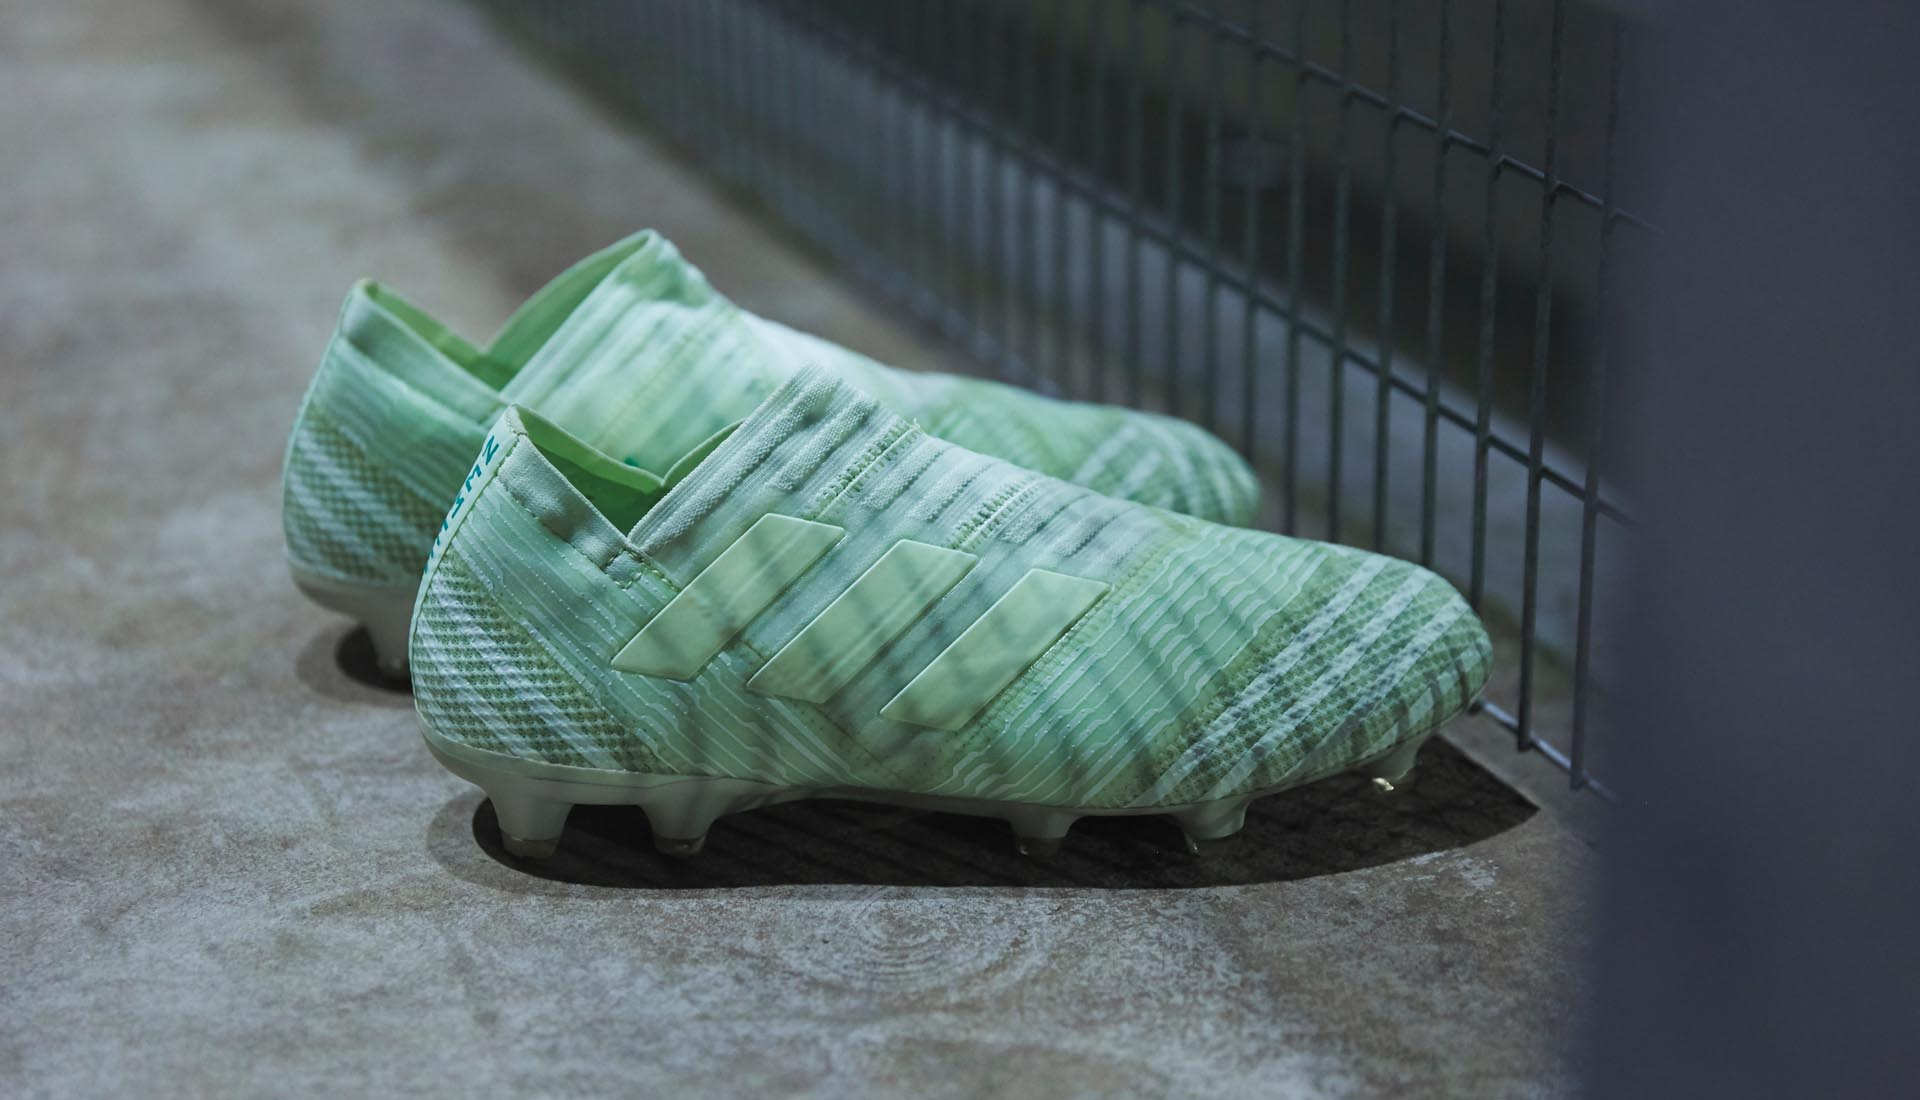 Adidas deadly strike pack nemeziz 17+